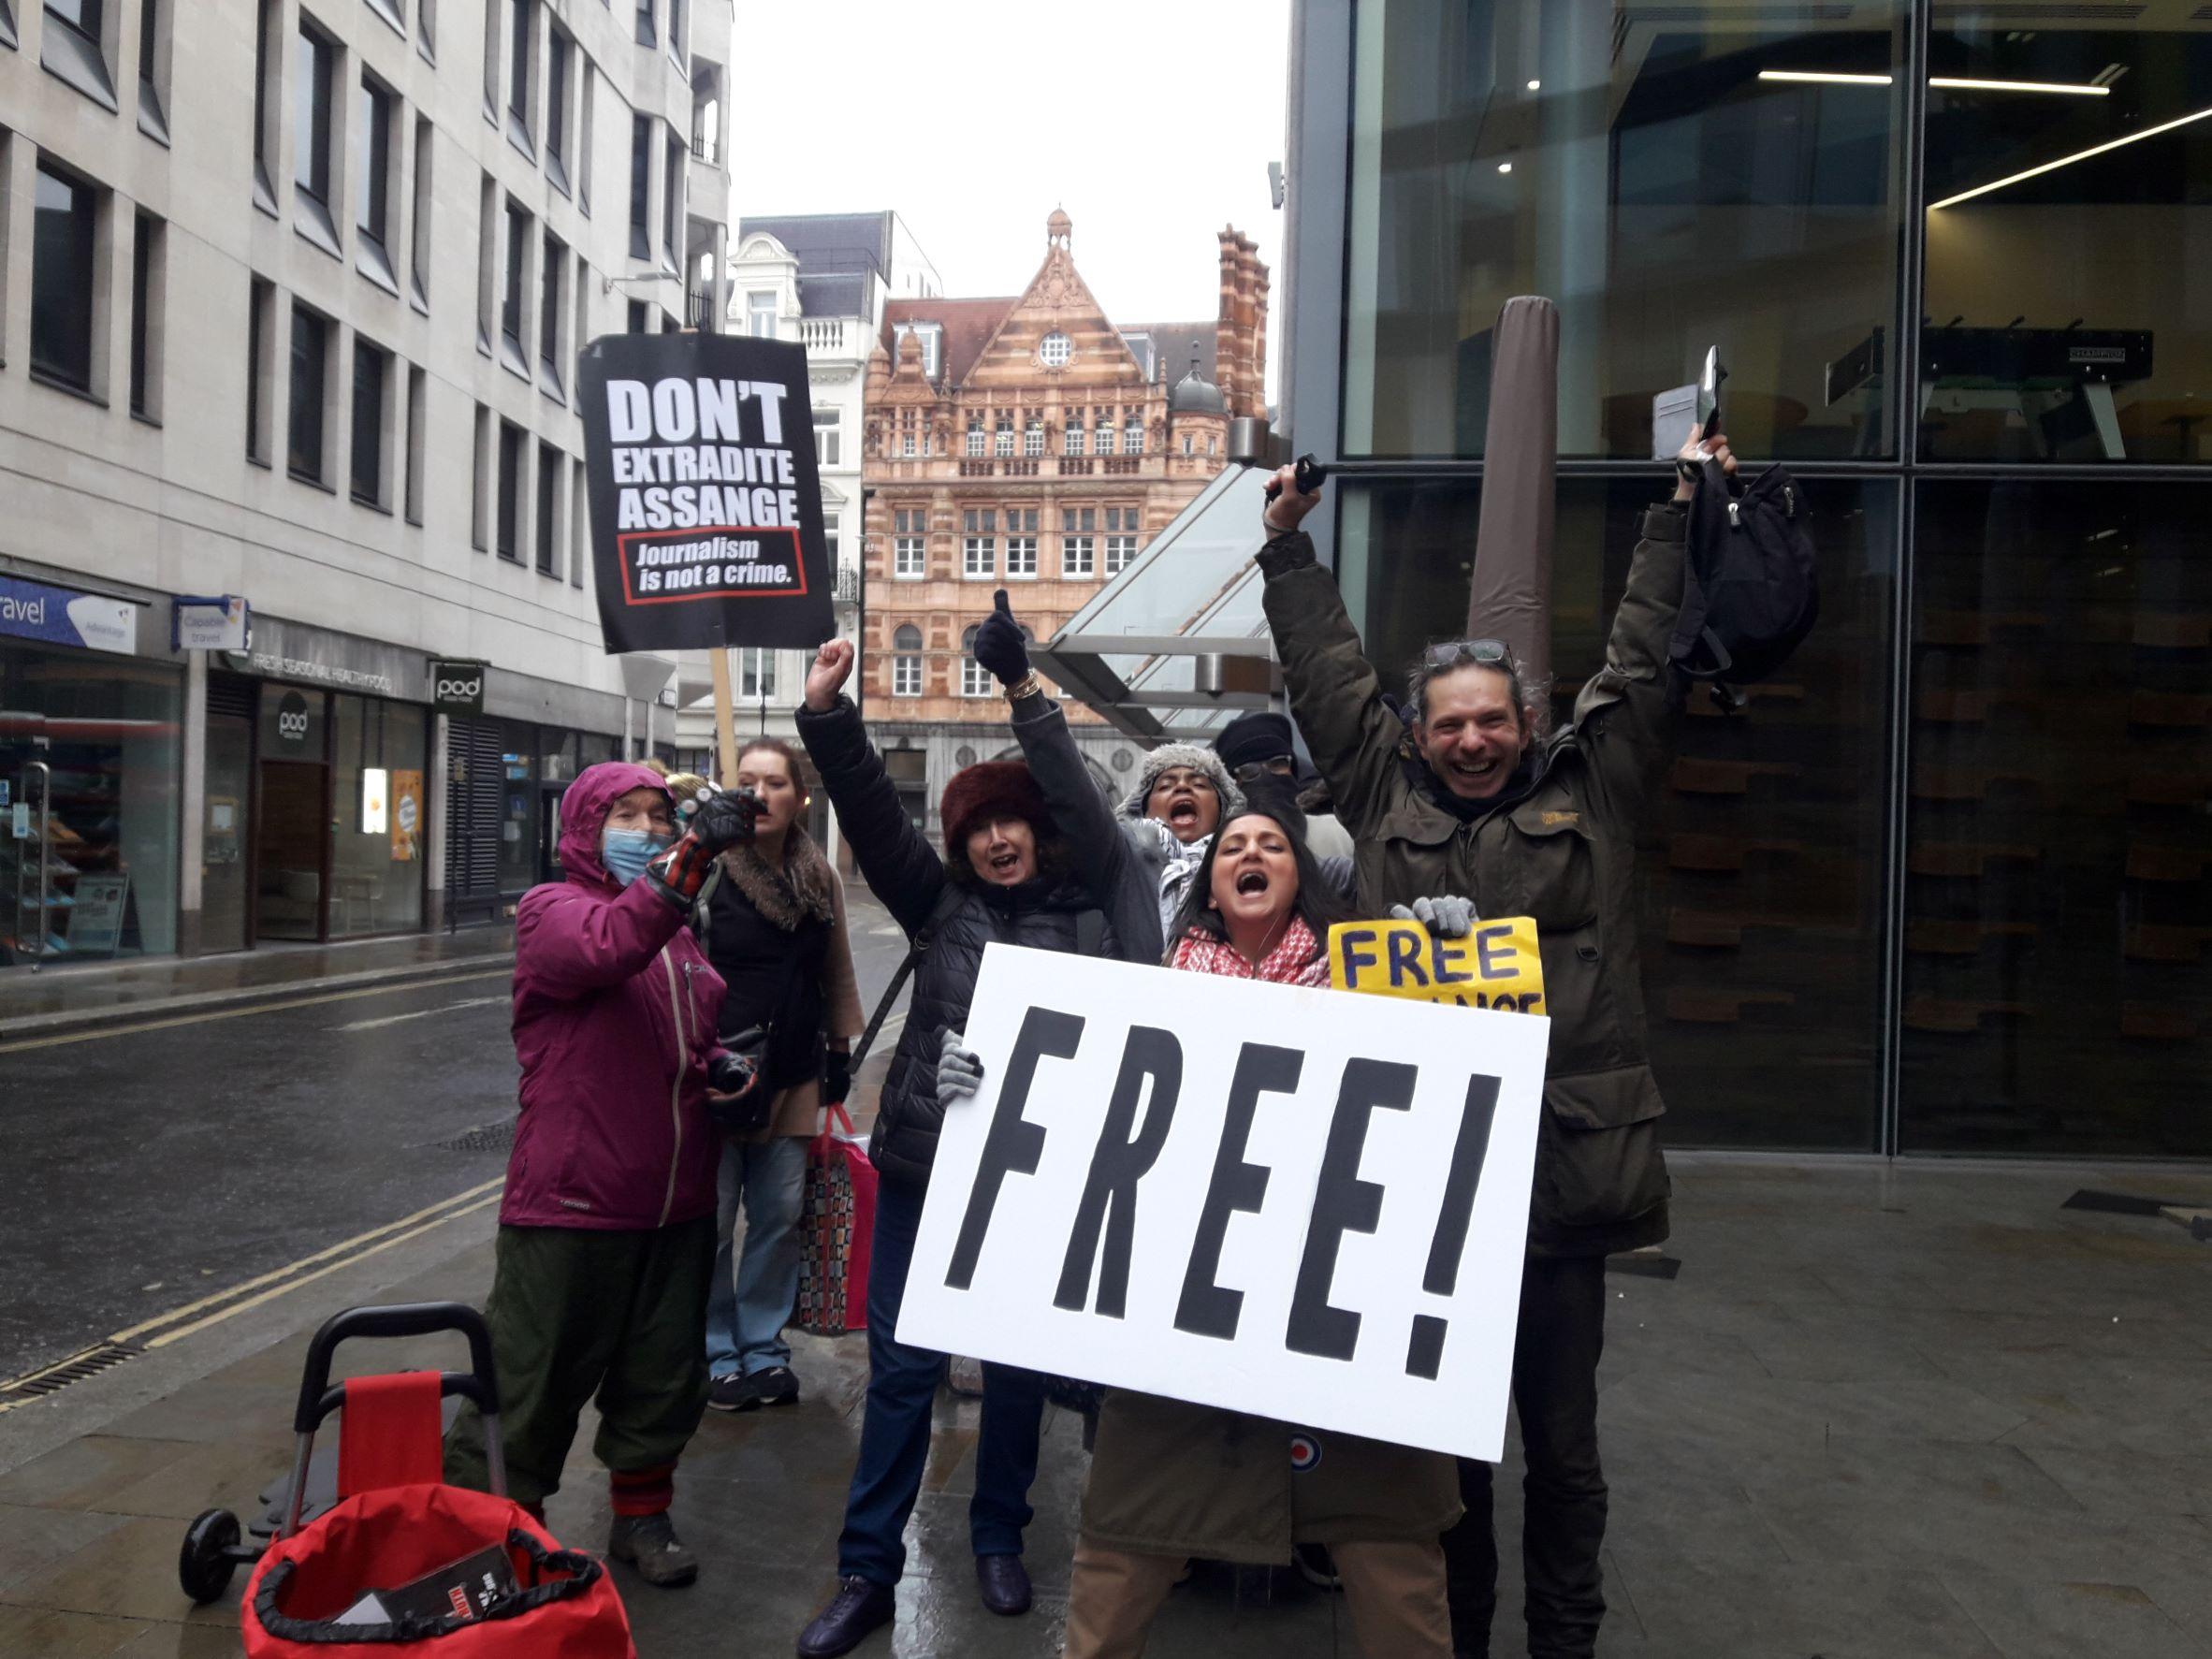 protest_photos:freepeople.jpg